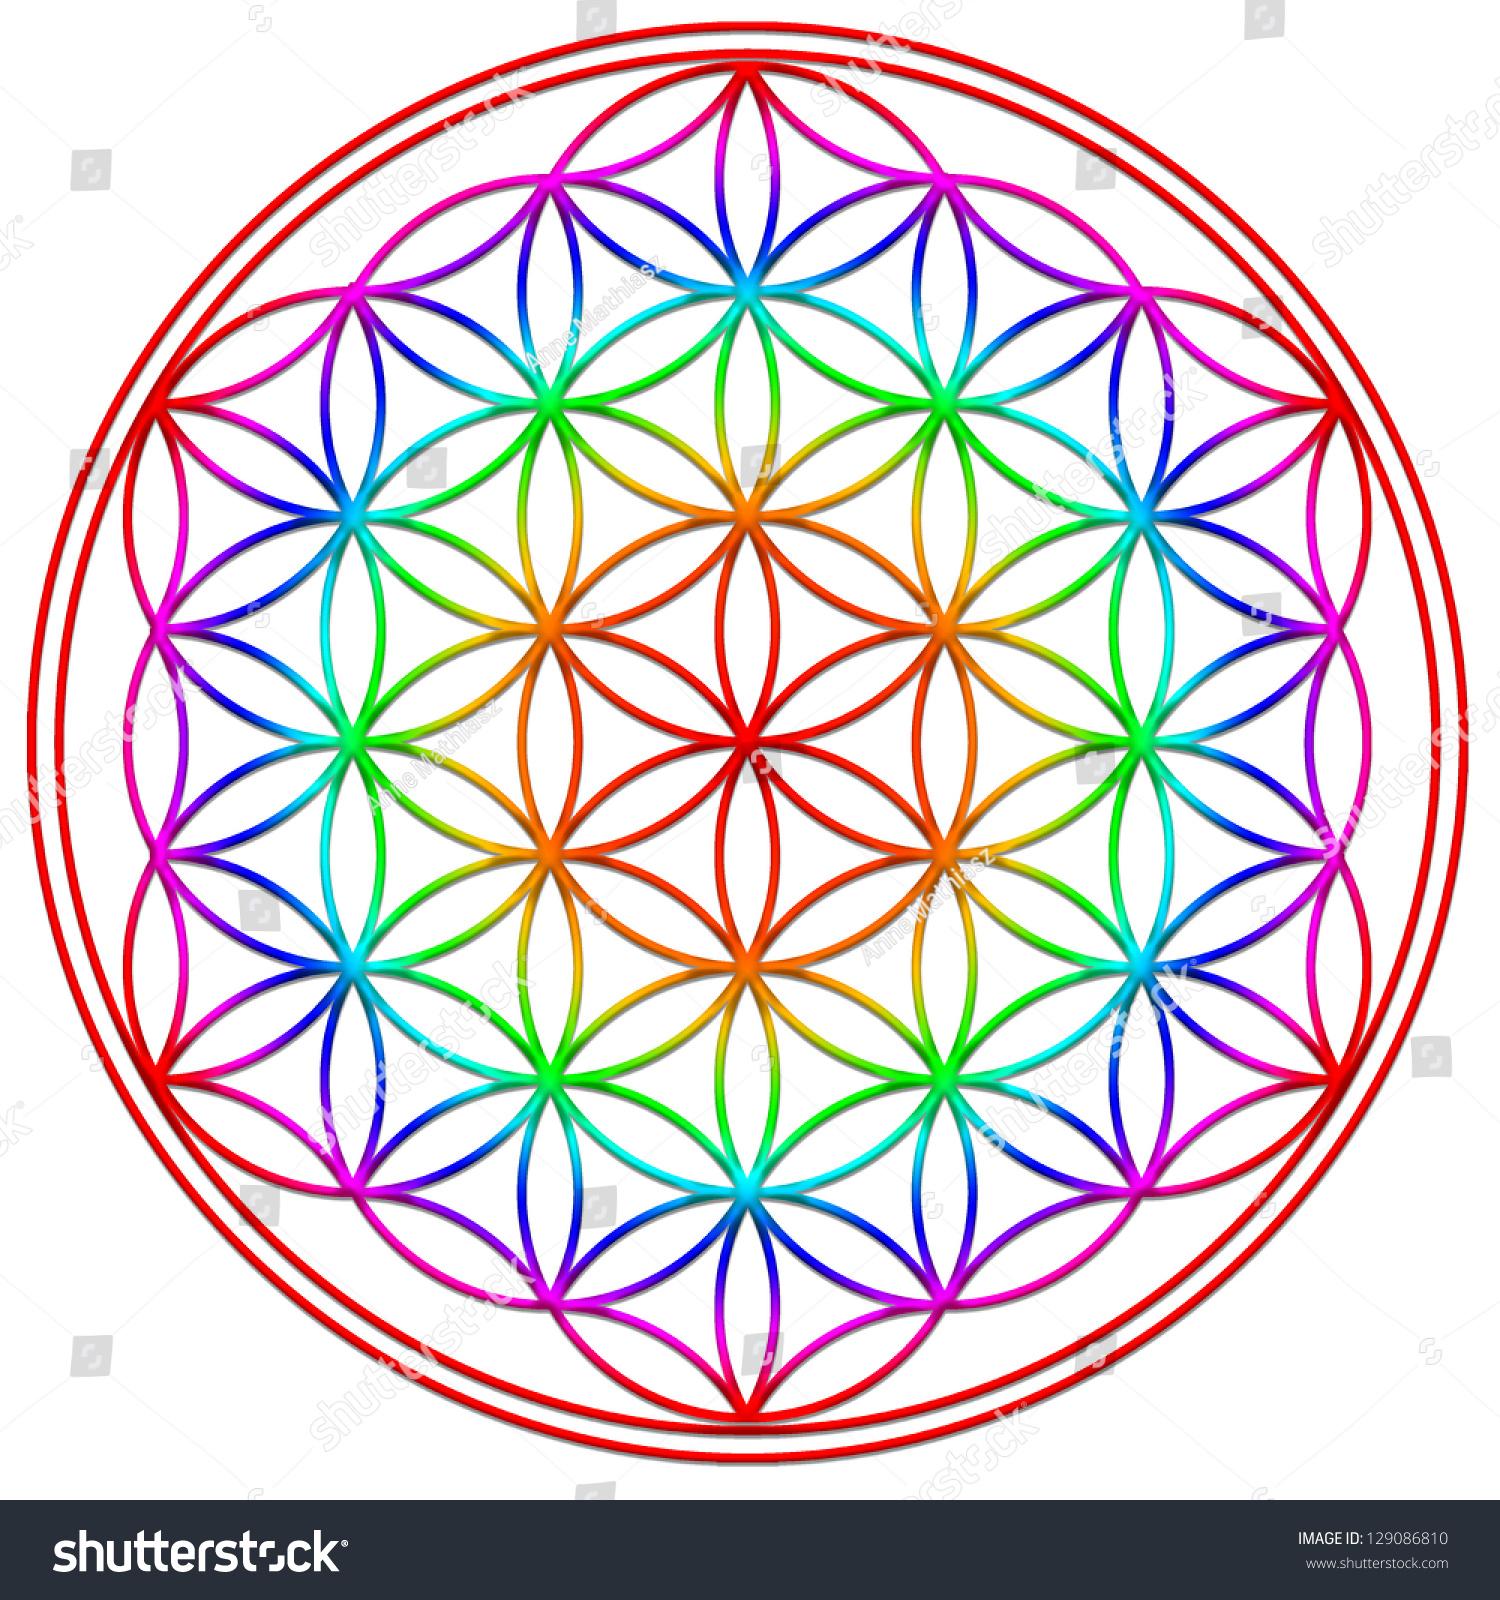 Symbols For Balance In Life